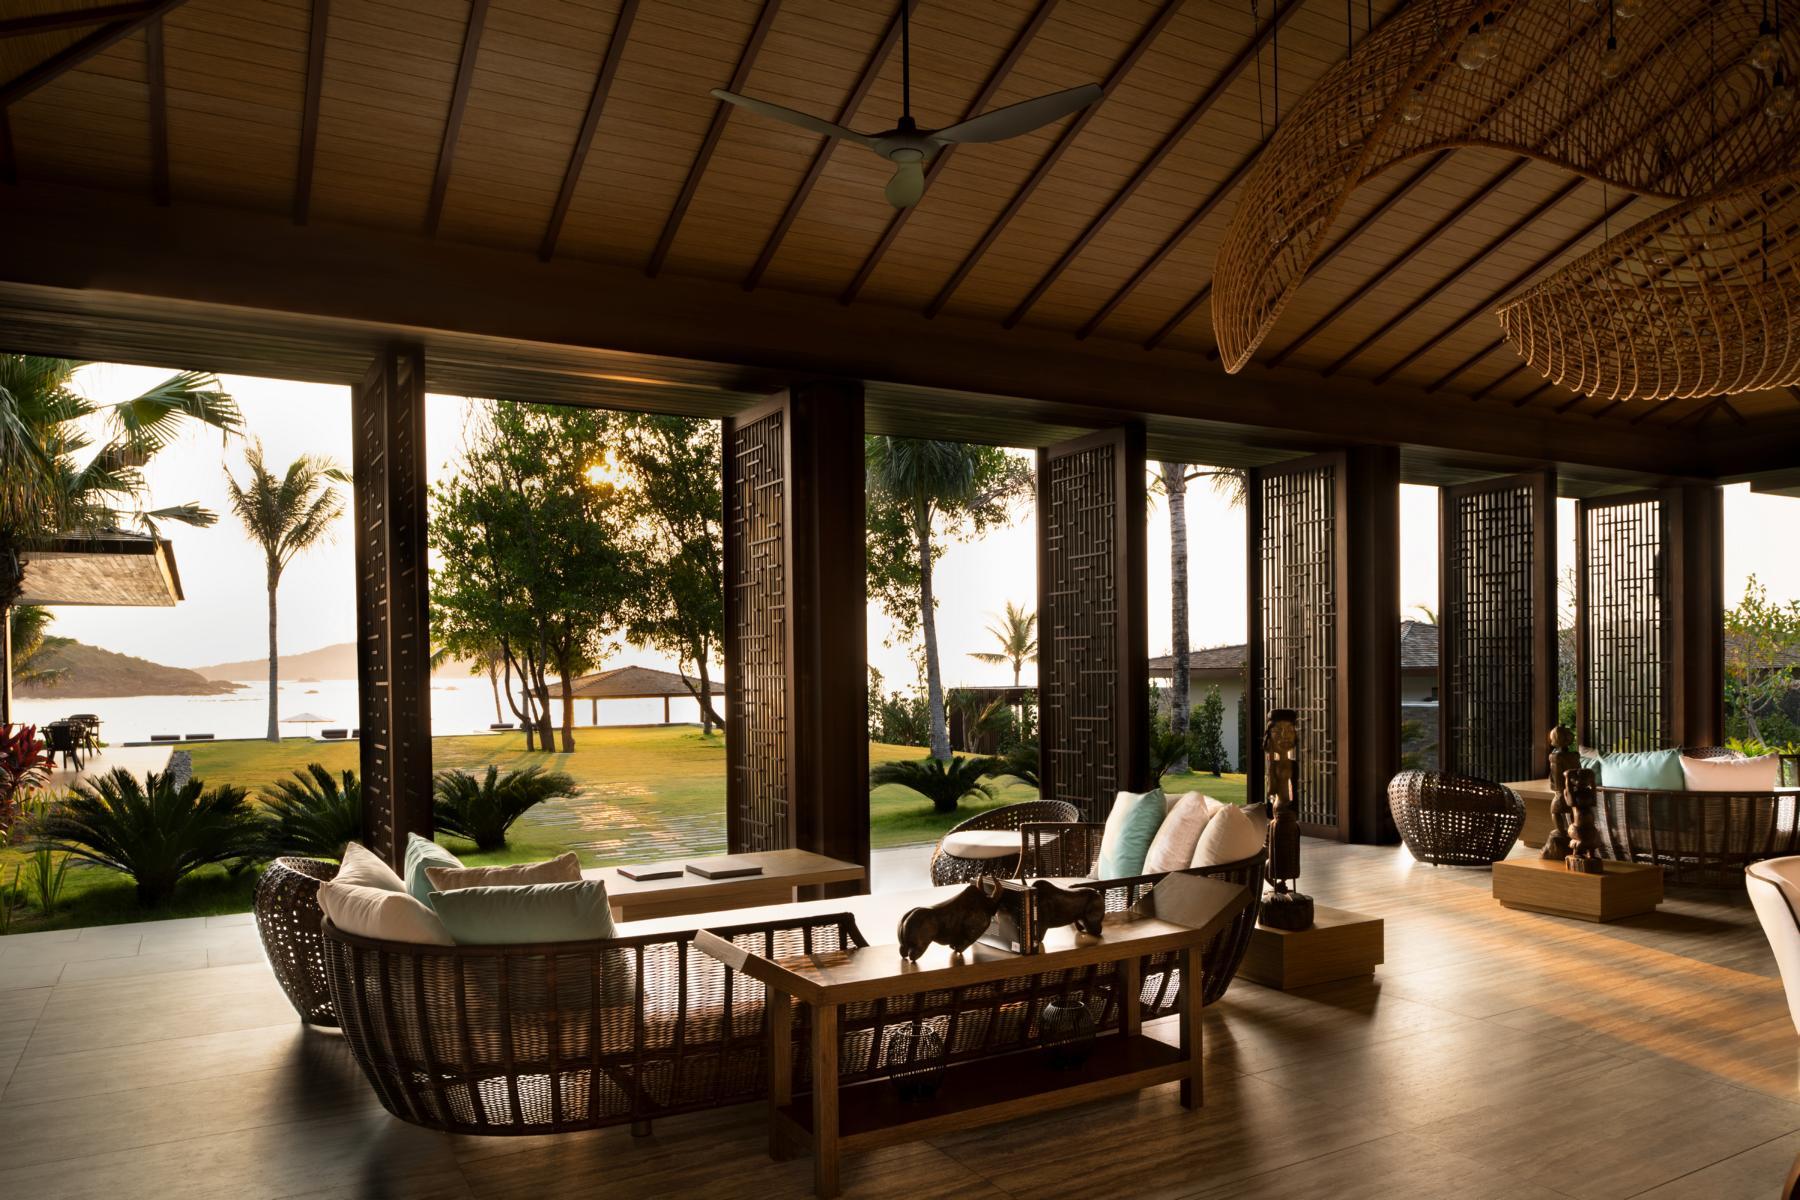 Die Lobby in den Anantara Villas Quy Nhon in Vietnam